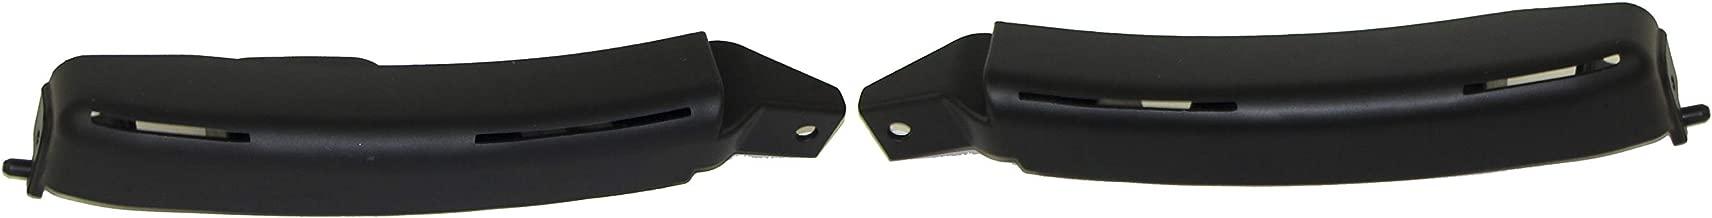 FRONT BUMPER SIDE RETAINER BRACKET LH & RH FOR DODGE RAM 1500 2013-2018